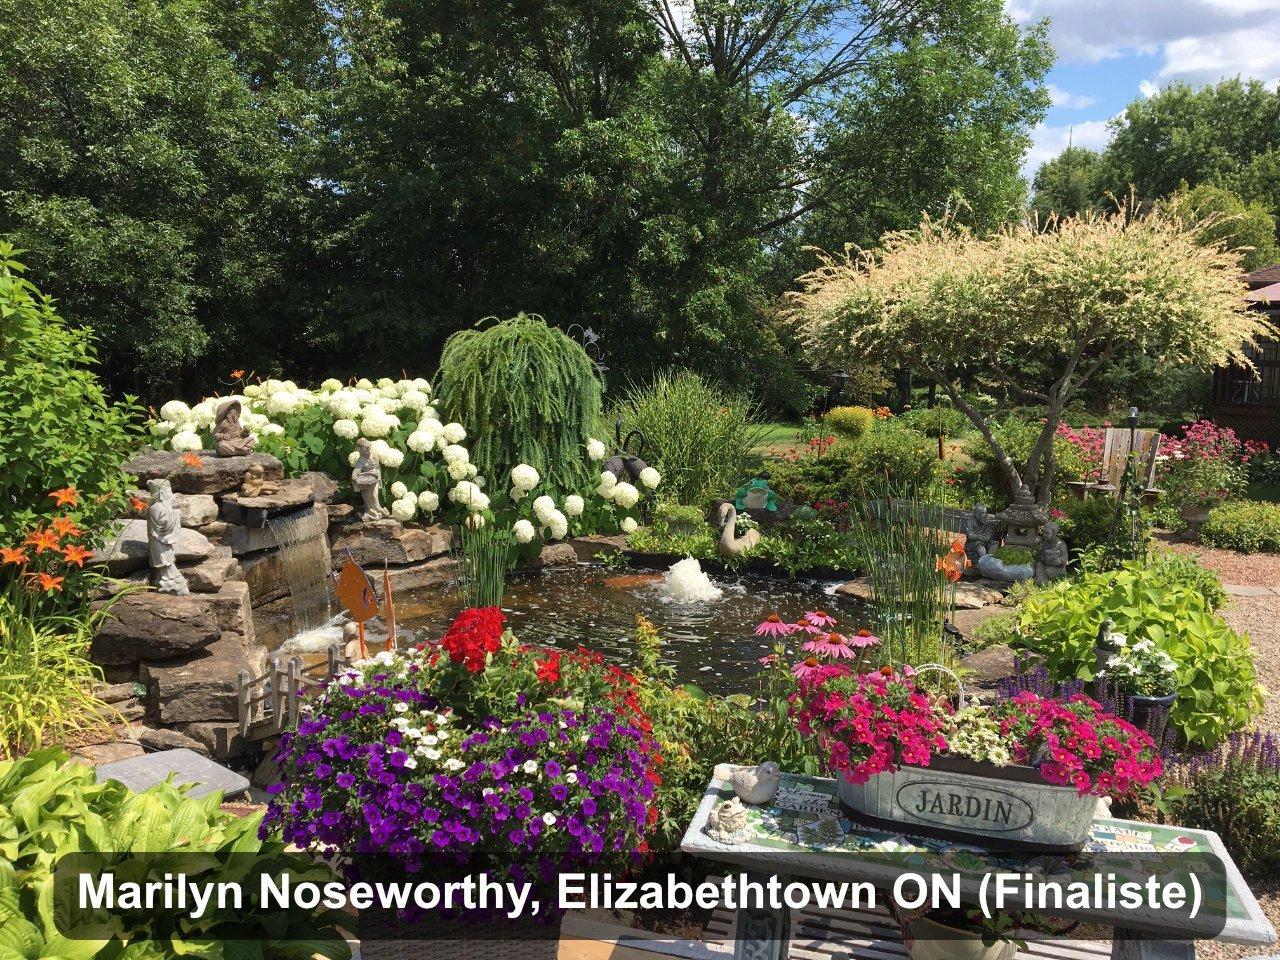 Finalist - Marilyn Noseworthy, Elizabethtown ON